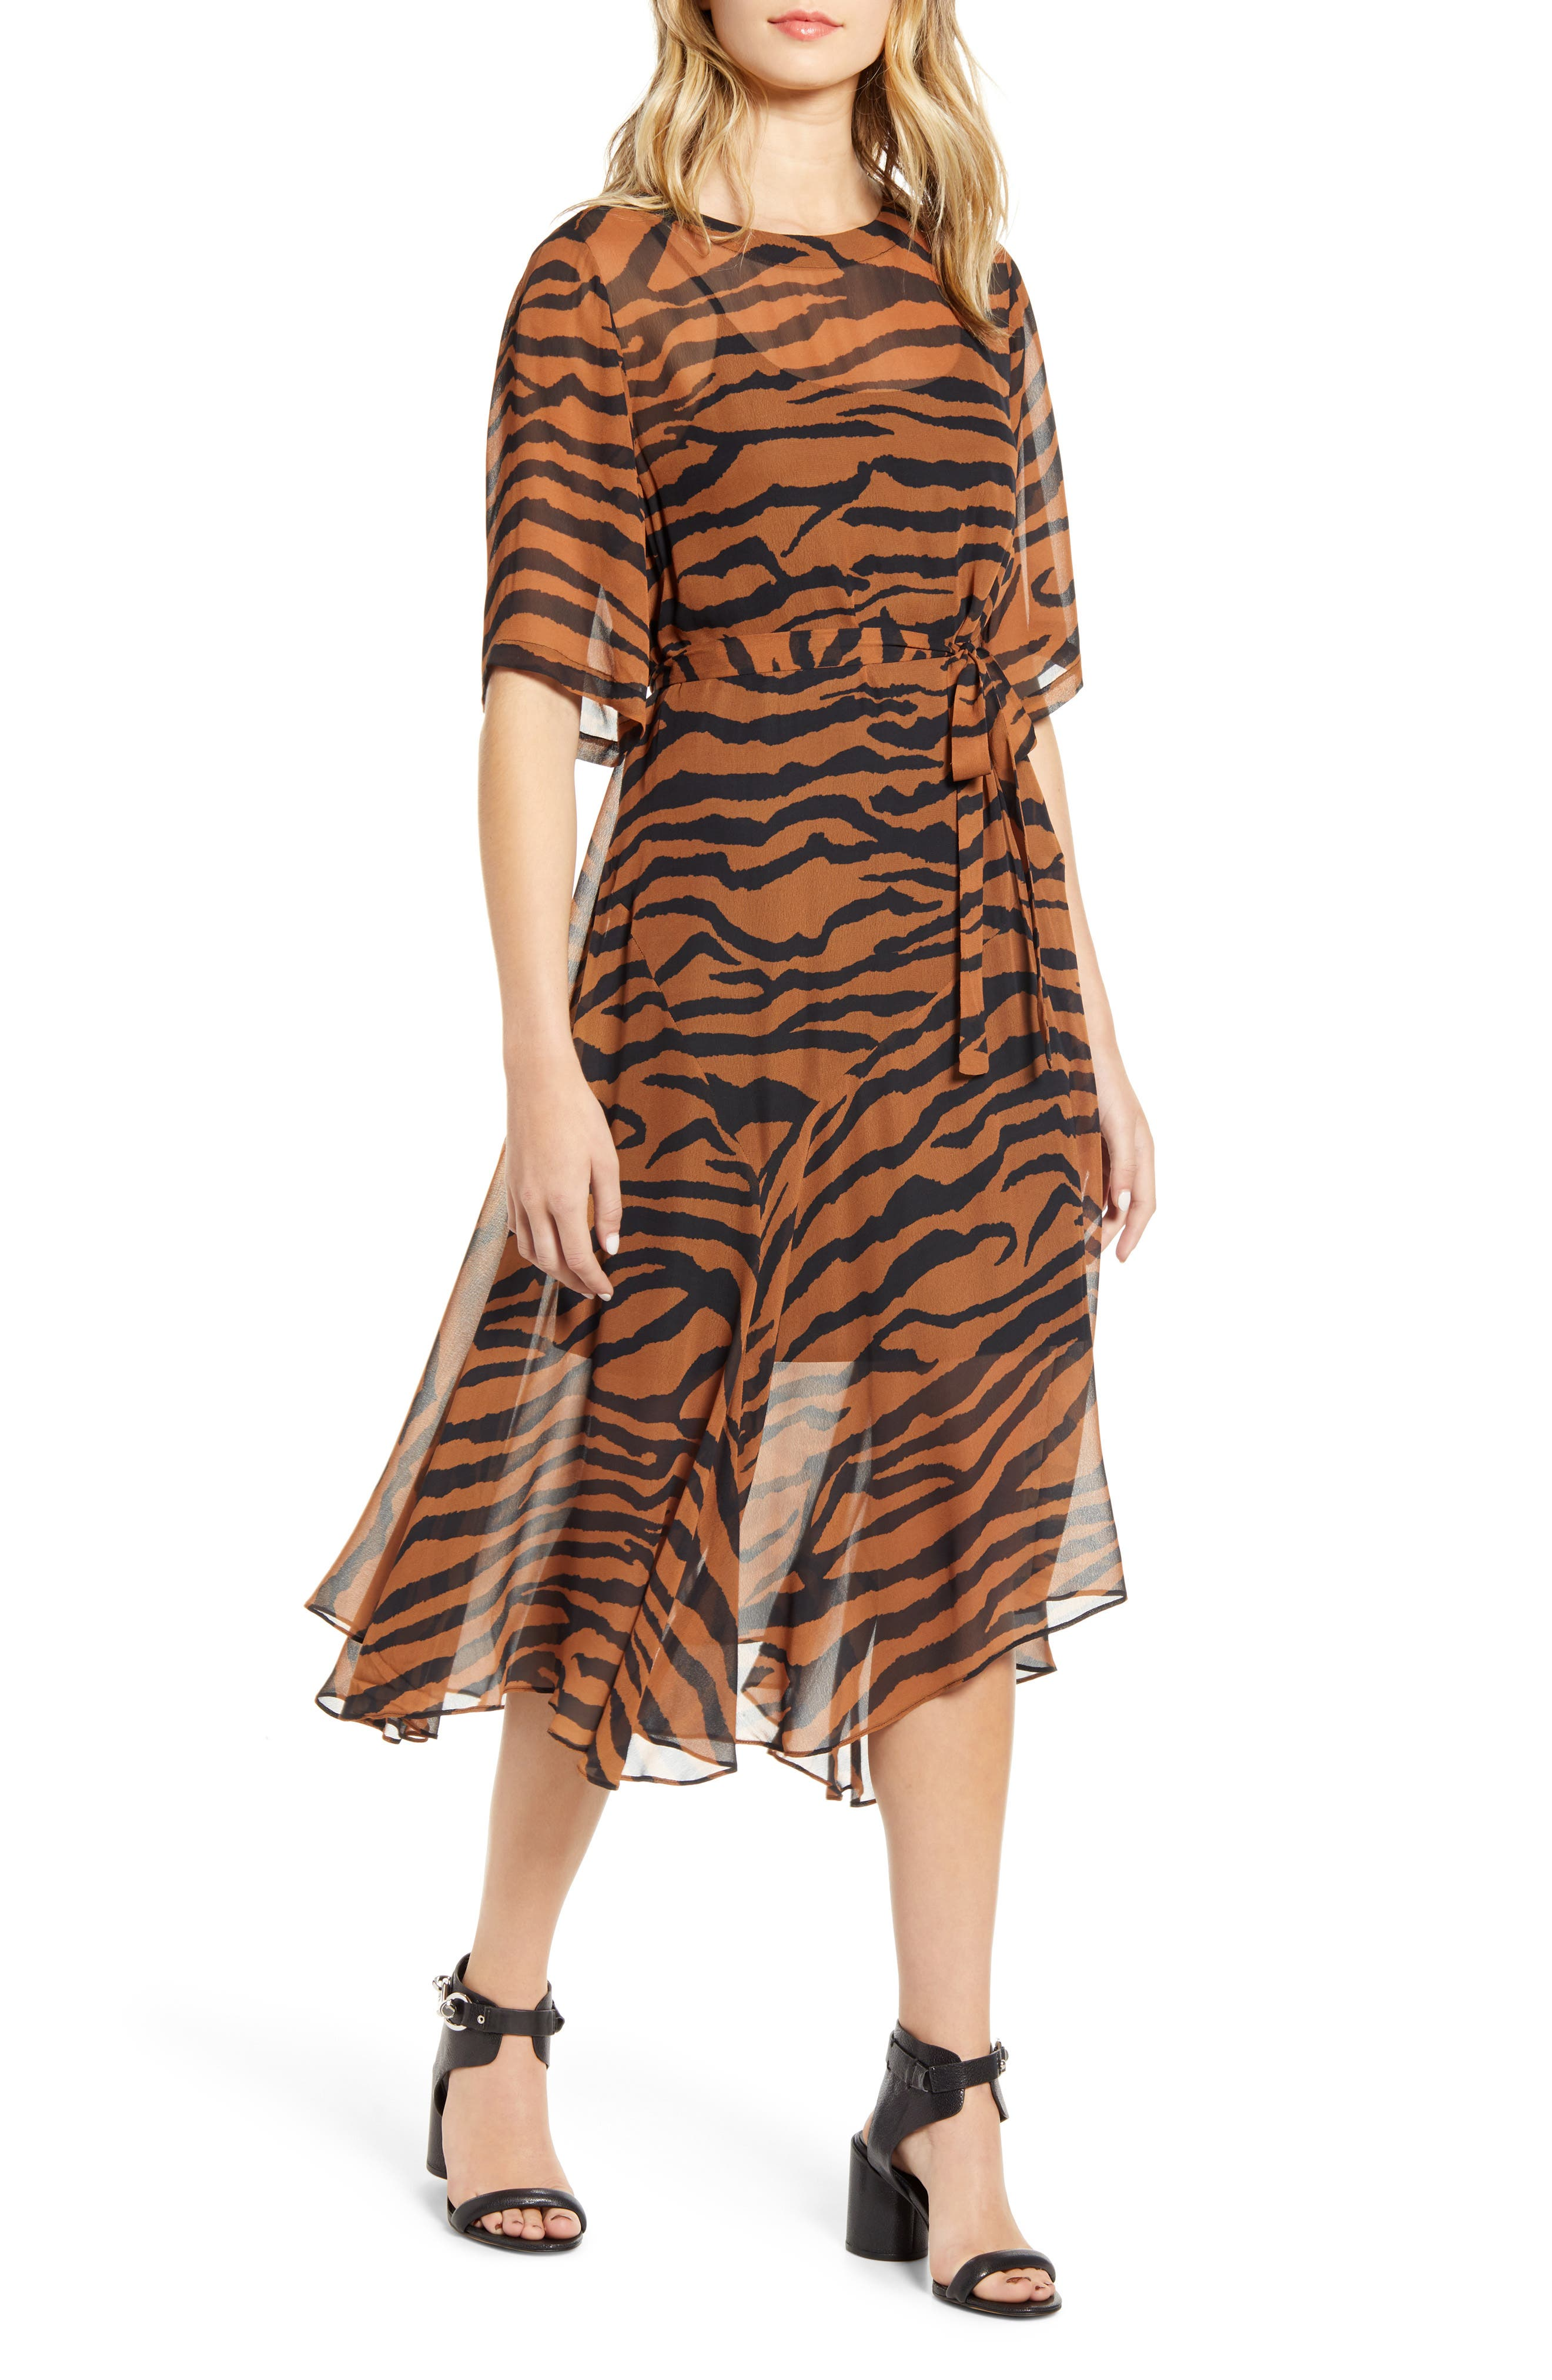 Allsaints Dresses Enki Zephyr Tiger Stripe Dress